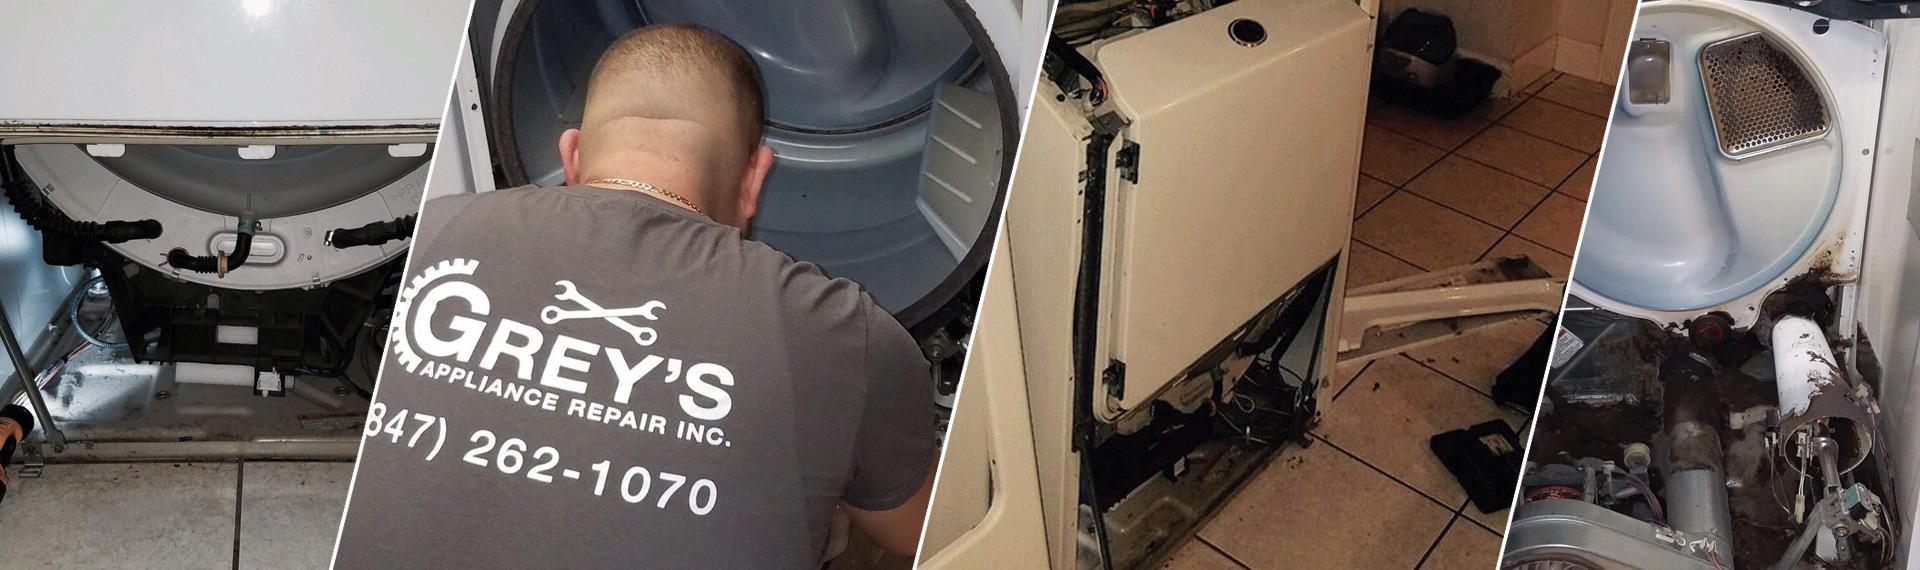 Grey's Appliance Repair INC